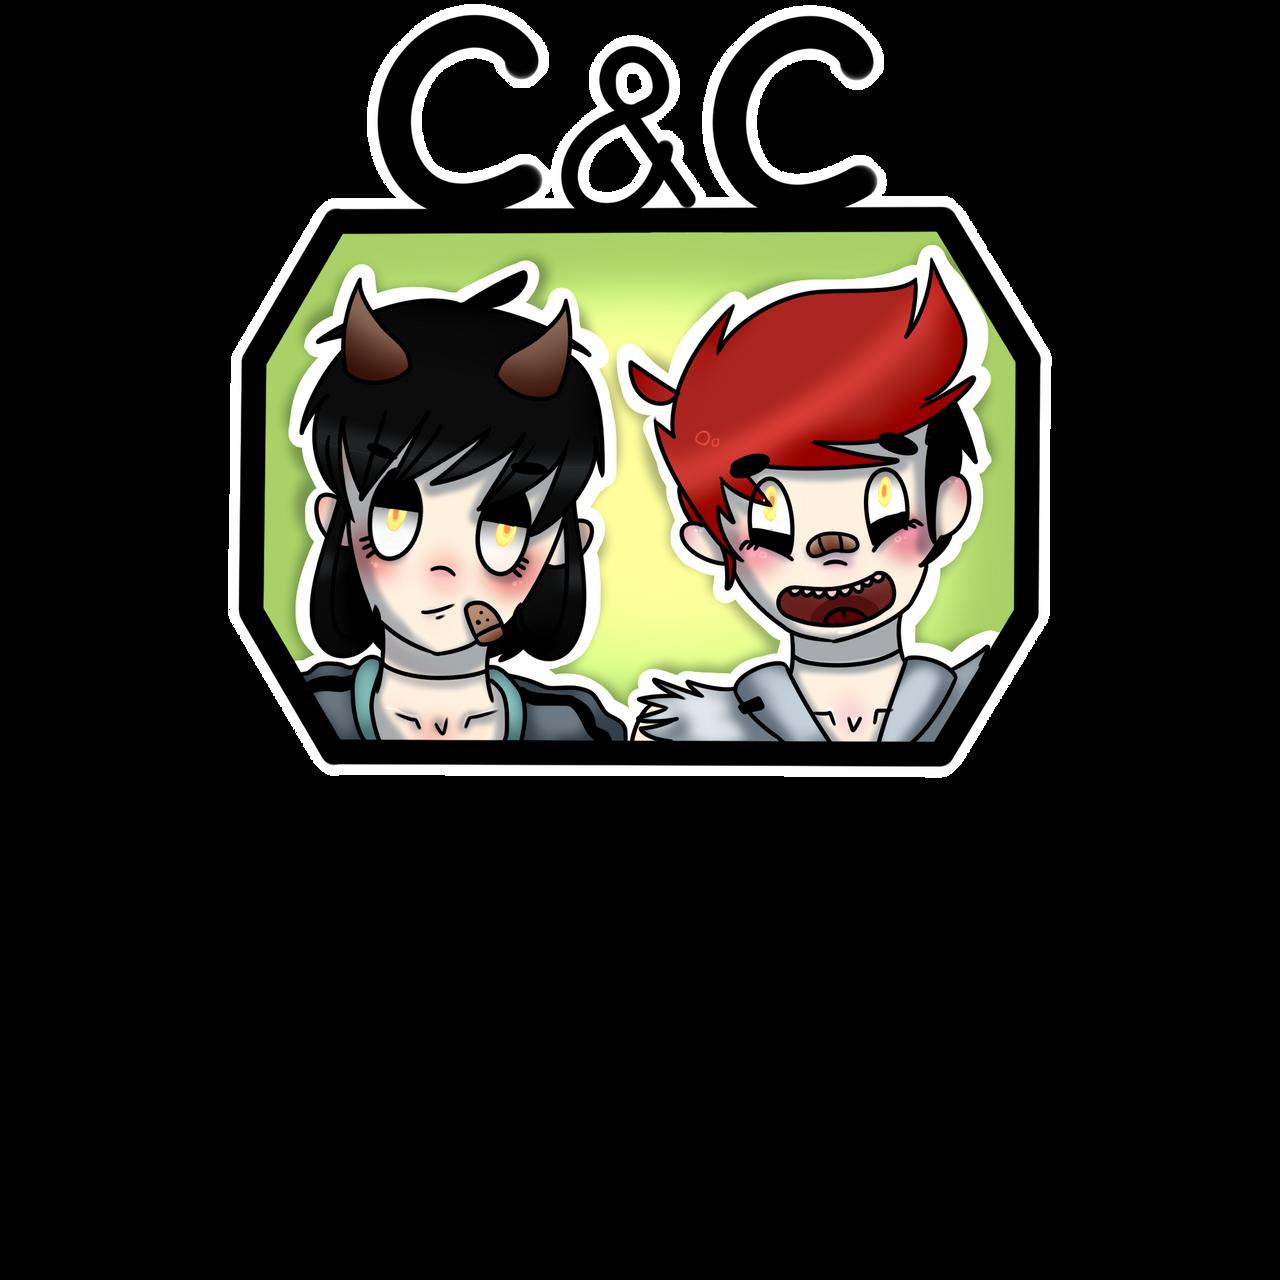 C'nC Logo